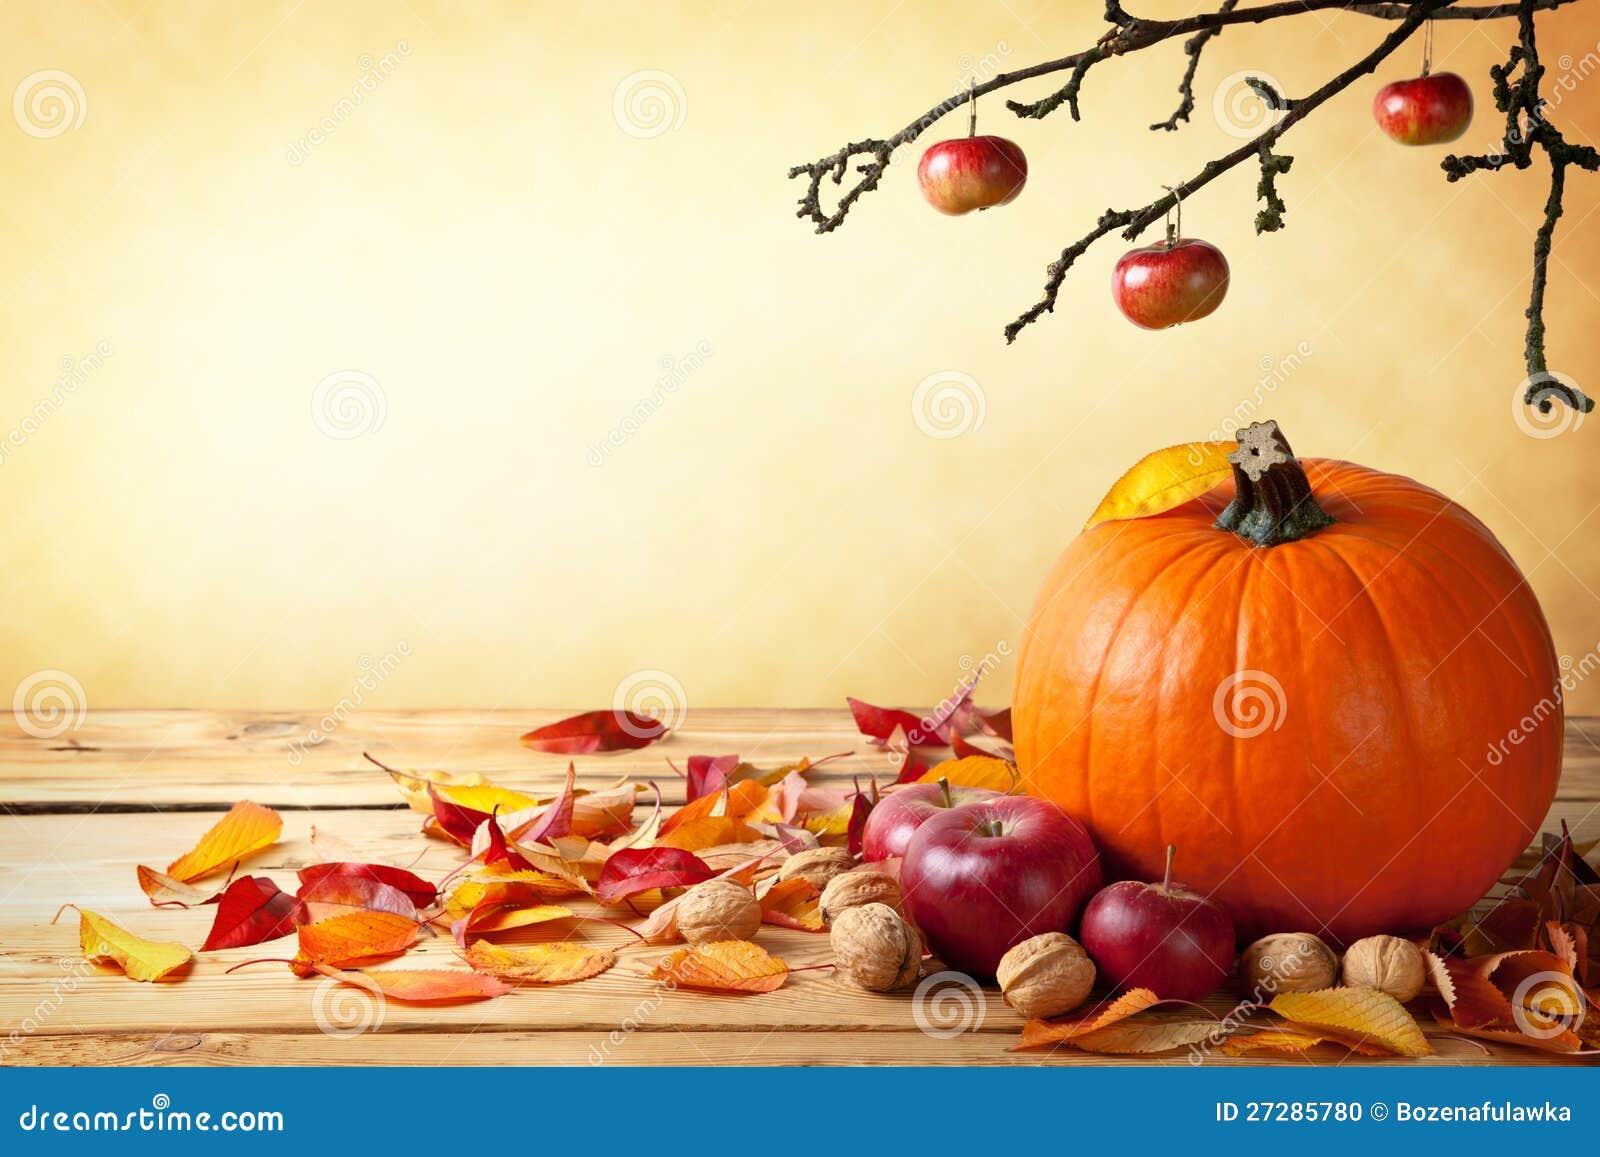 Conceito do outono